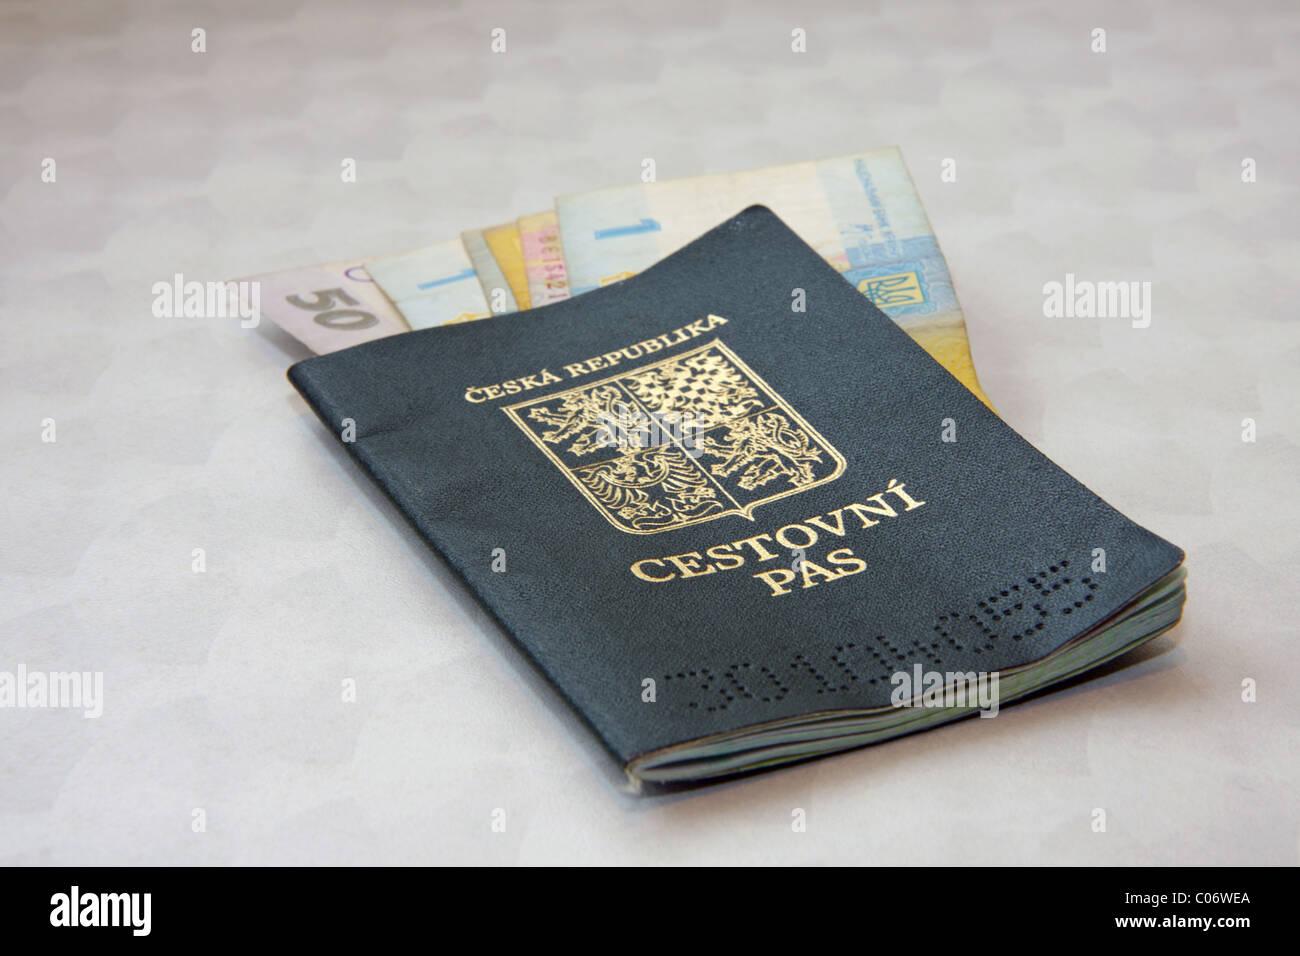 Czech passport with Ukrainian banknotes - Stock Image